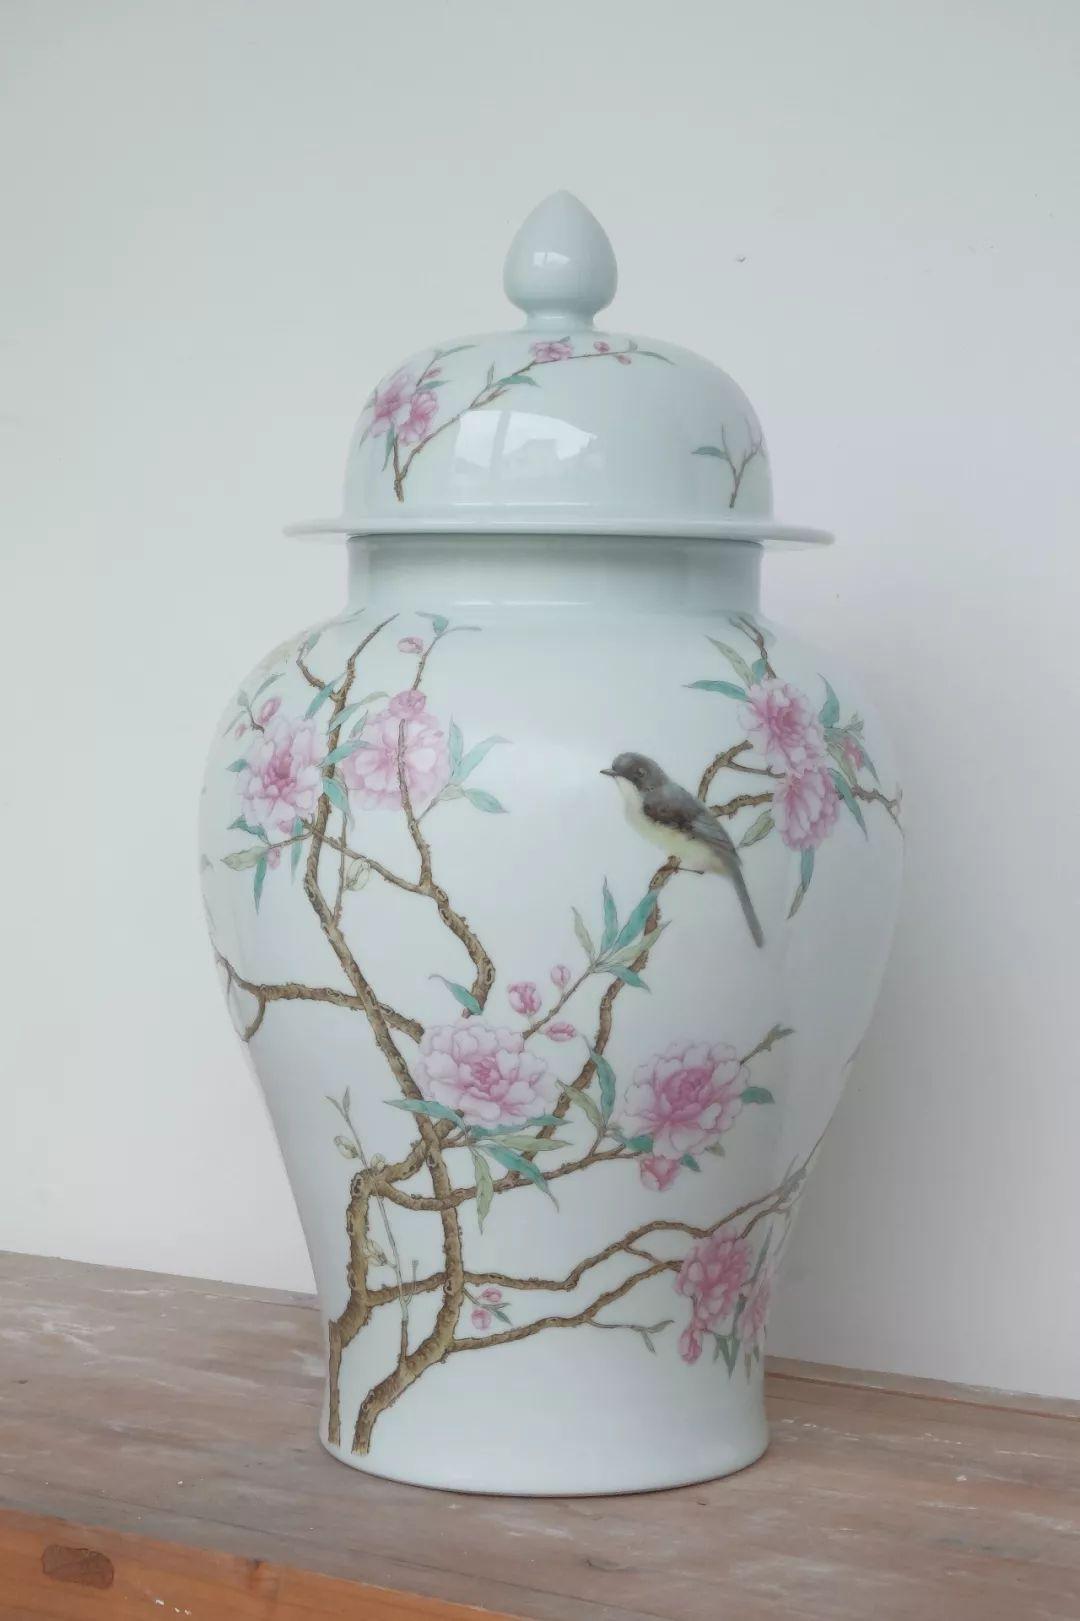 Flower and bird ceramic vases